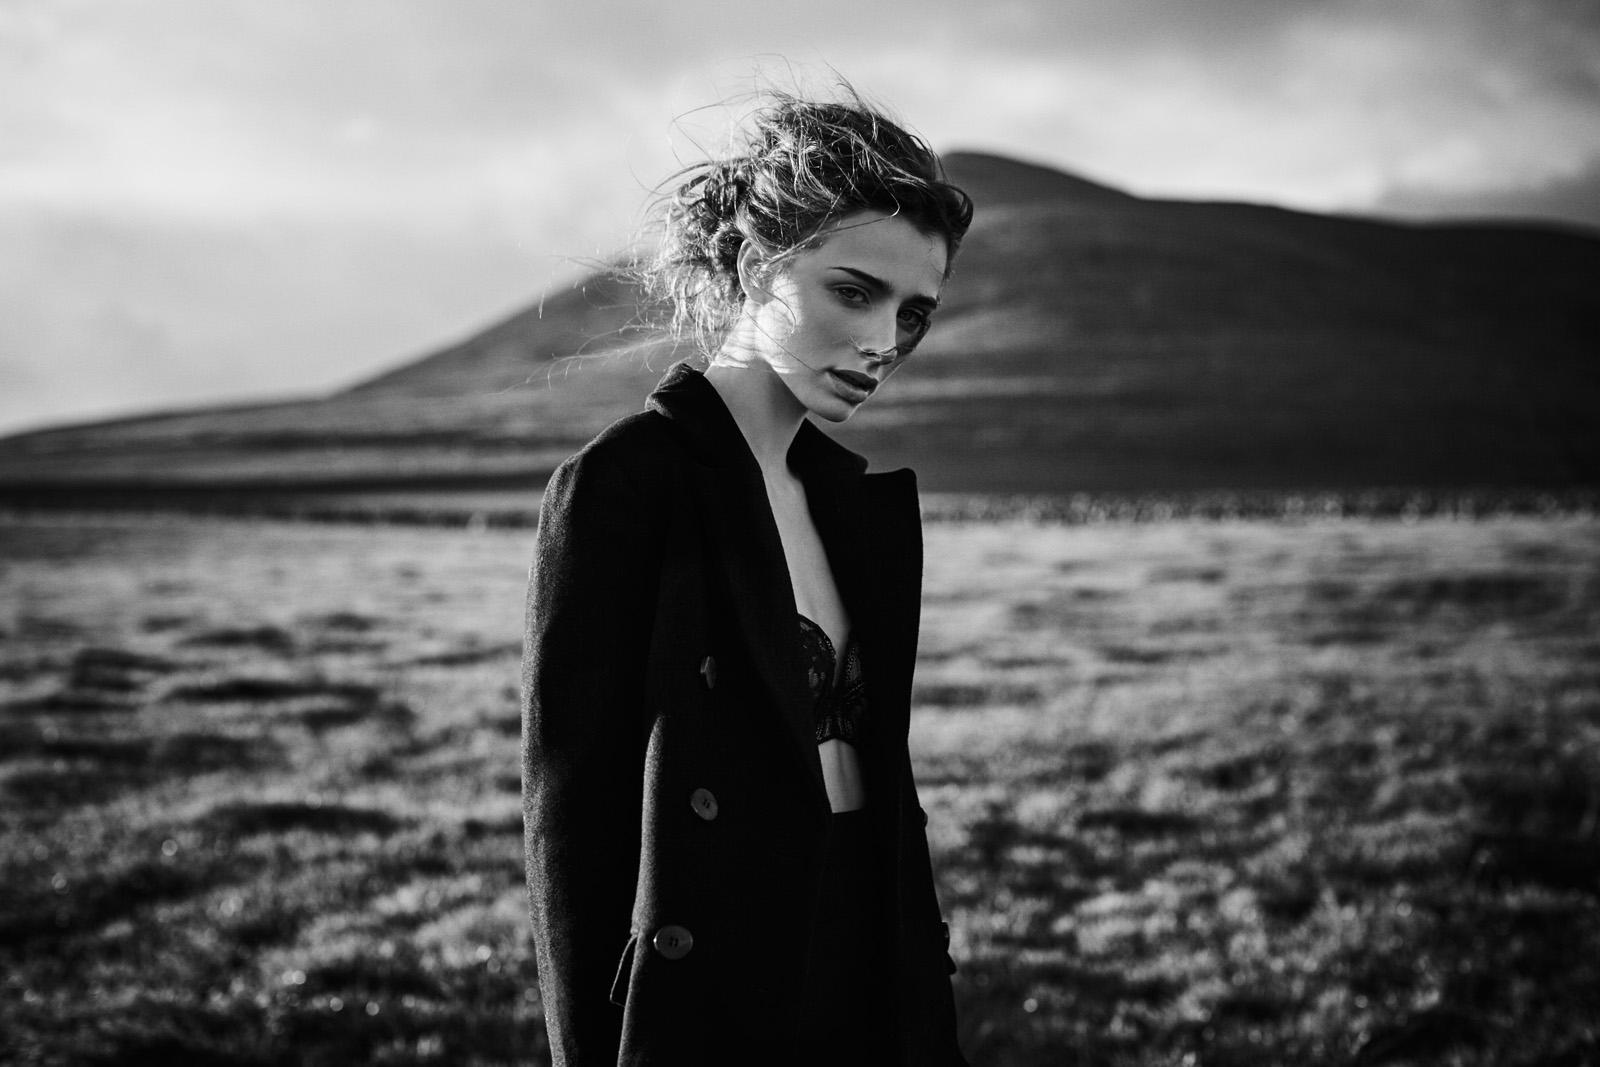 Spirit-&-Flesh-Magazine_Matt-Lucari_IRELAND_8